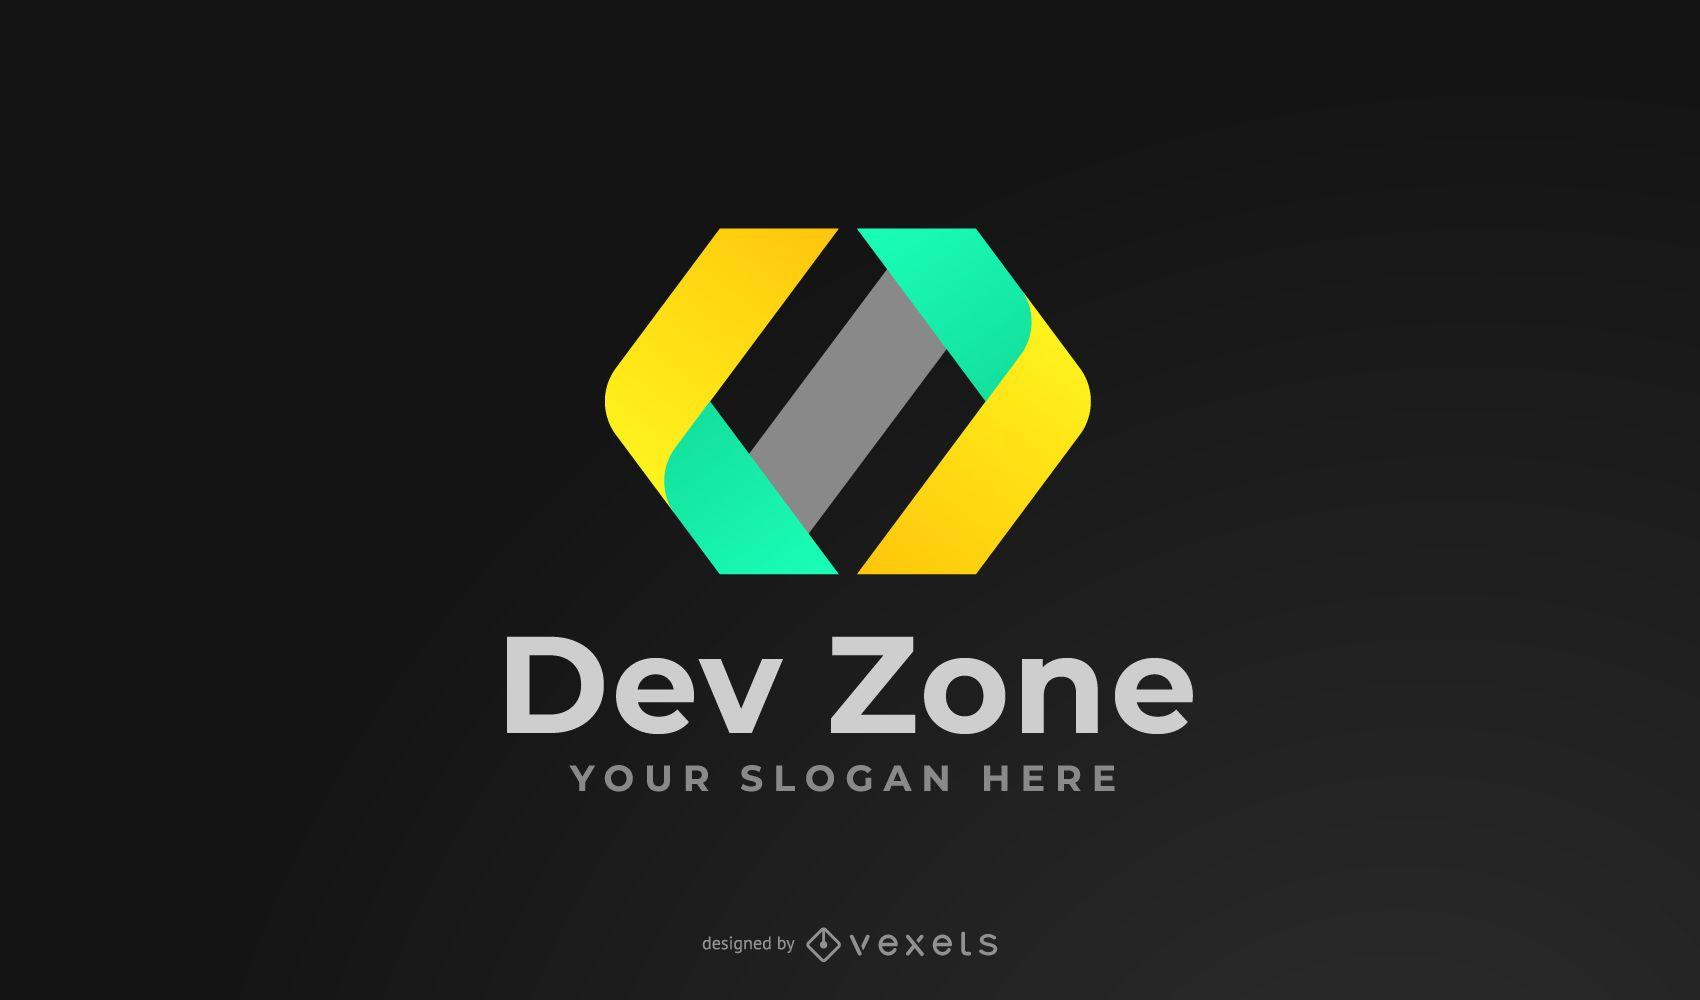 Design de logotipo da Dev Zone